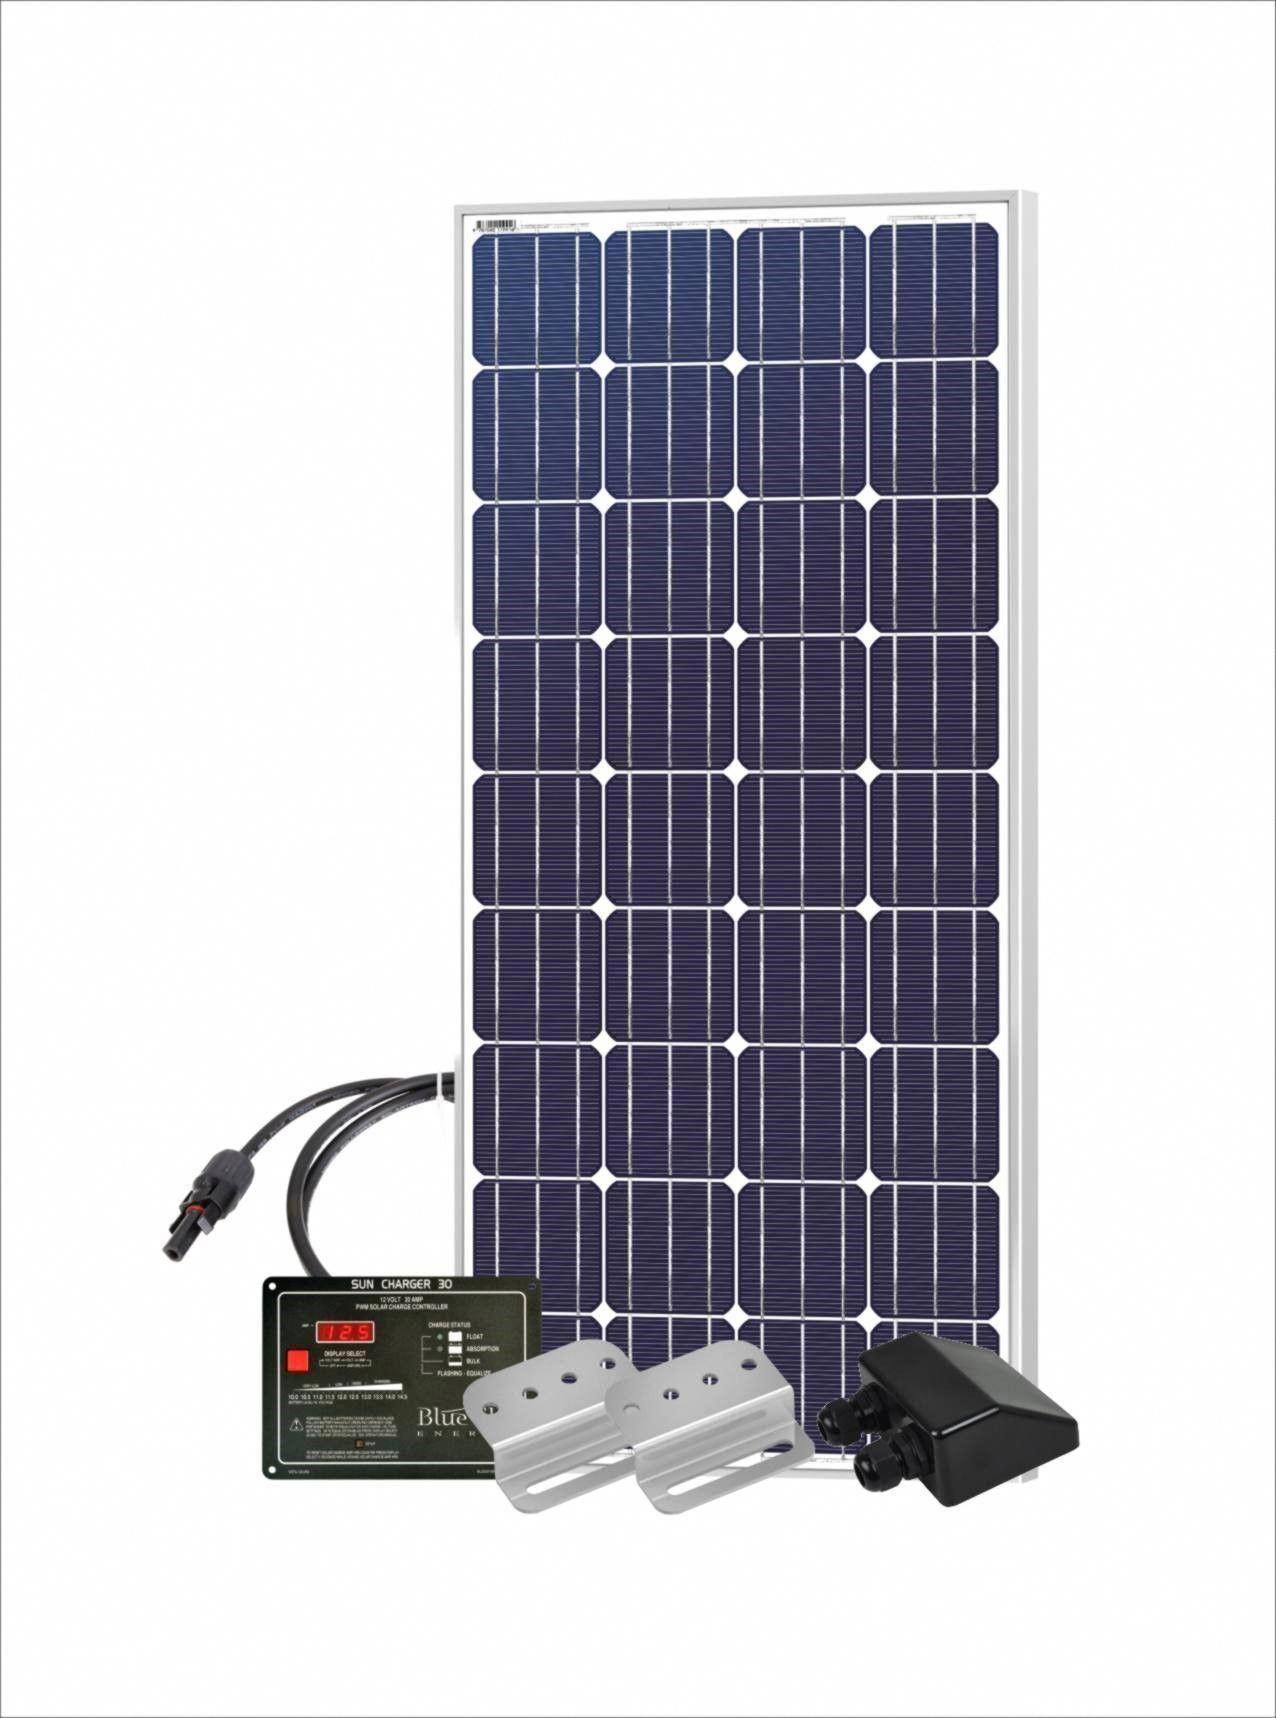 150 Watt 12 Volt Dc Rv Solar Panel Starter Kit With 150w Solar Panel Blue Sky Energy Sc30 Charge Controller Sola In 2020 Rv Solar Panels Best Solar Panels Solar Panels